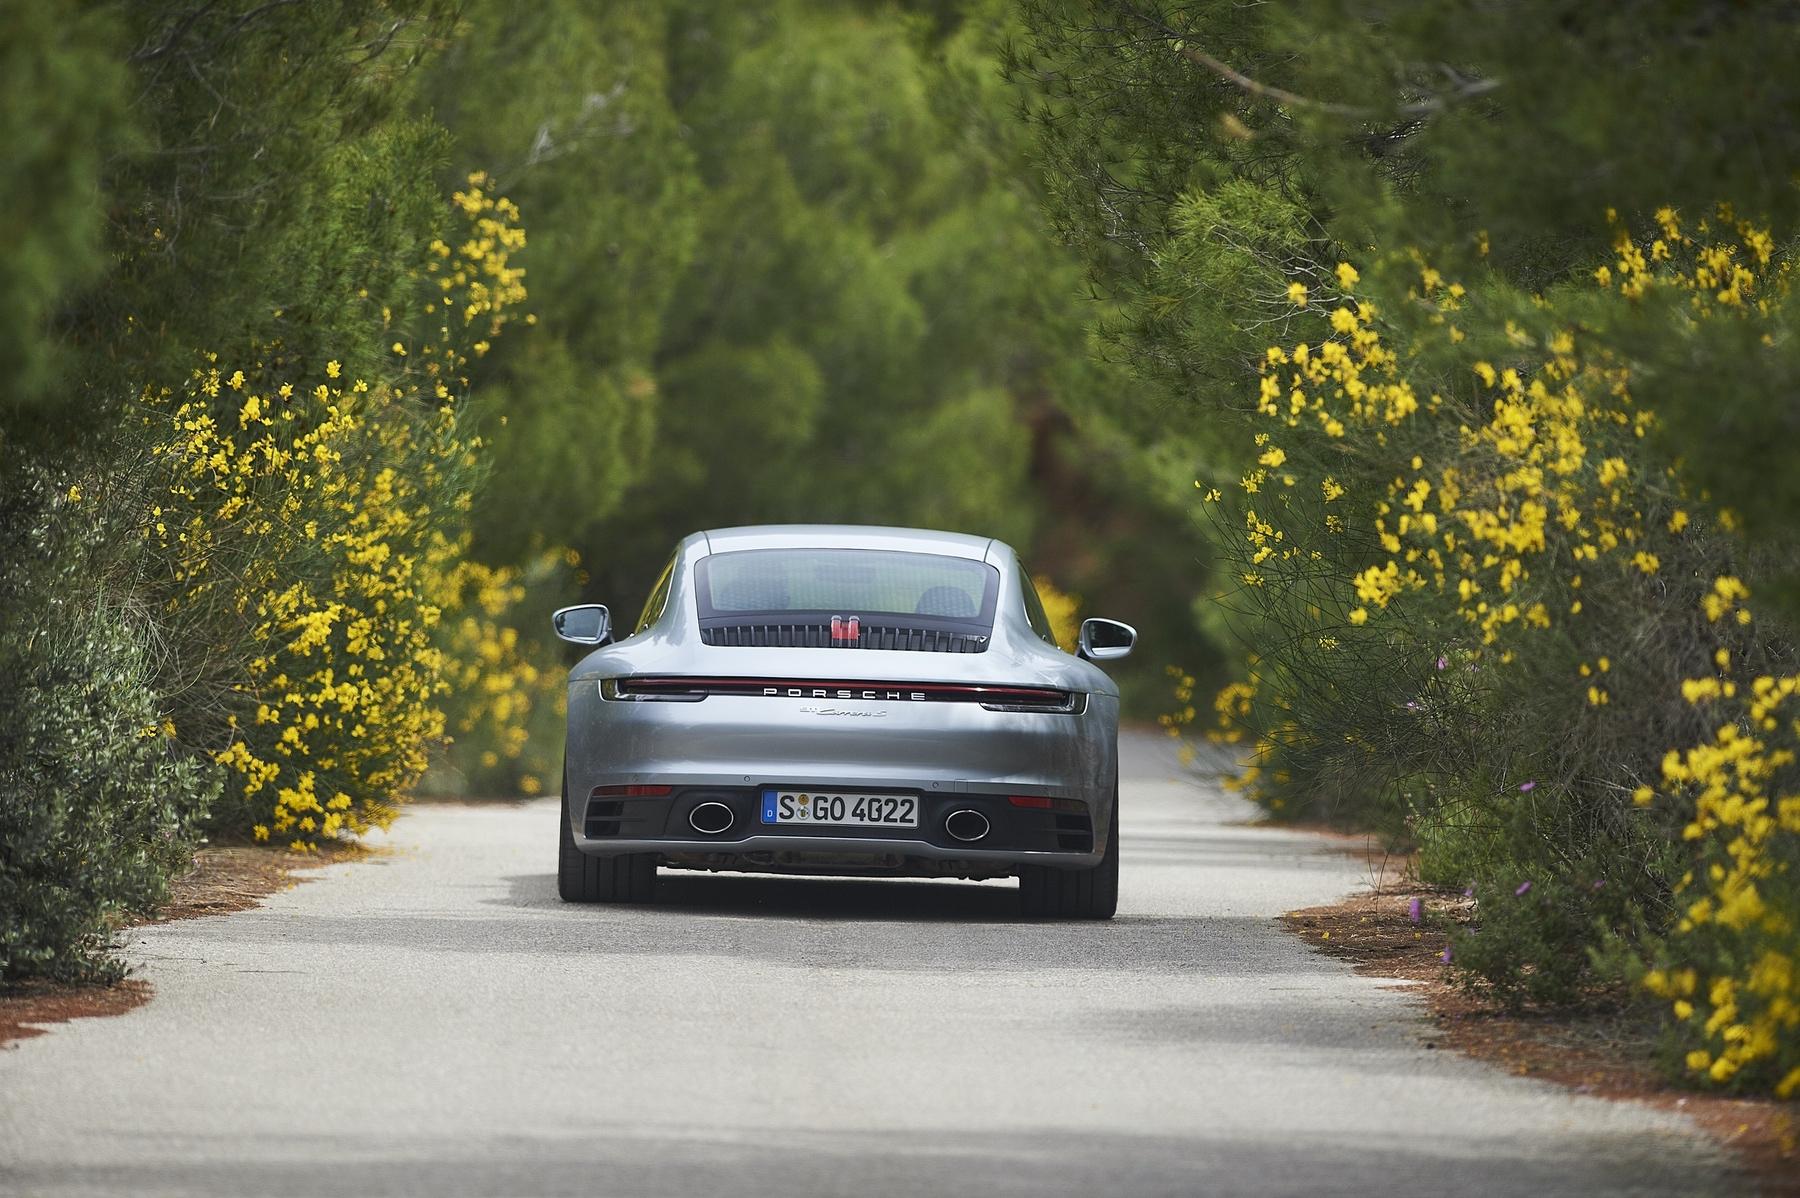 Test_Drive_Porsche_911_Athens_0191